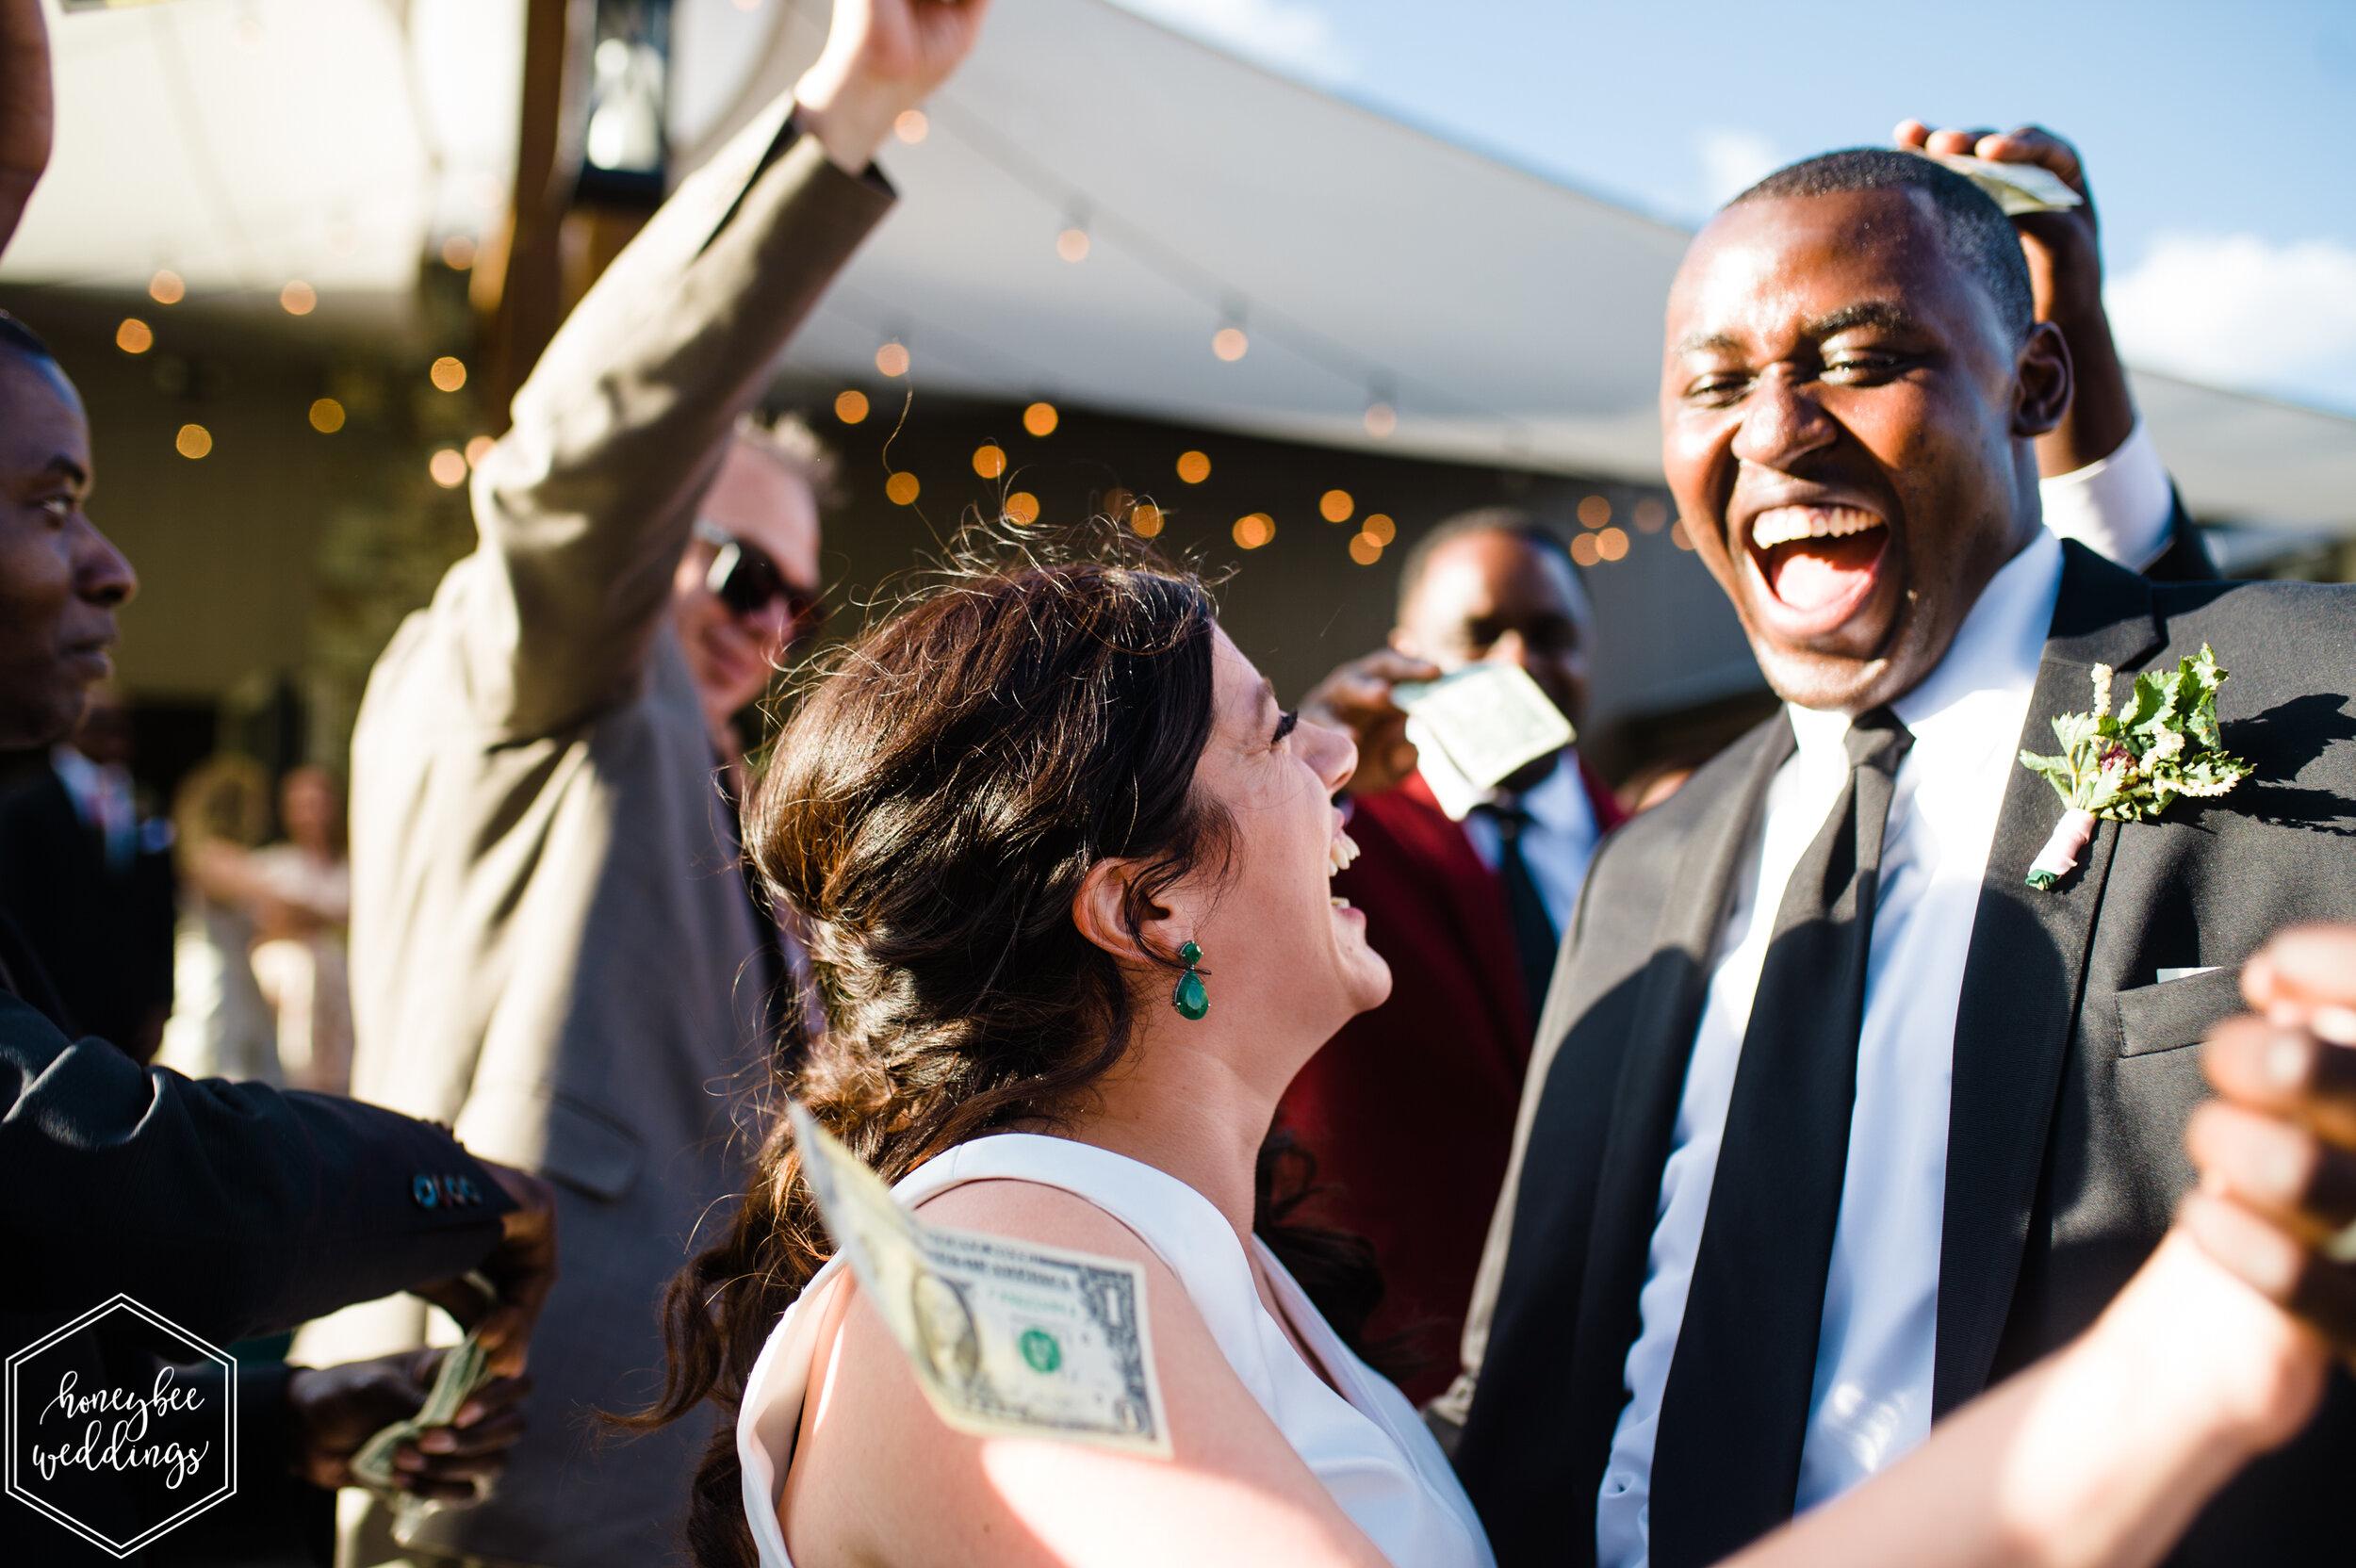 161White Raven Wedding_Montana Wedding Photographer_Rebekah & Likom_Honeybee Weddings_July 27, 2019-964.jpg